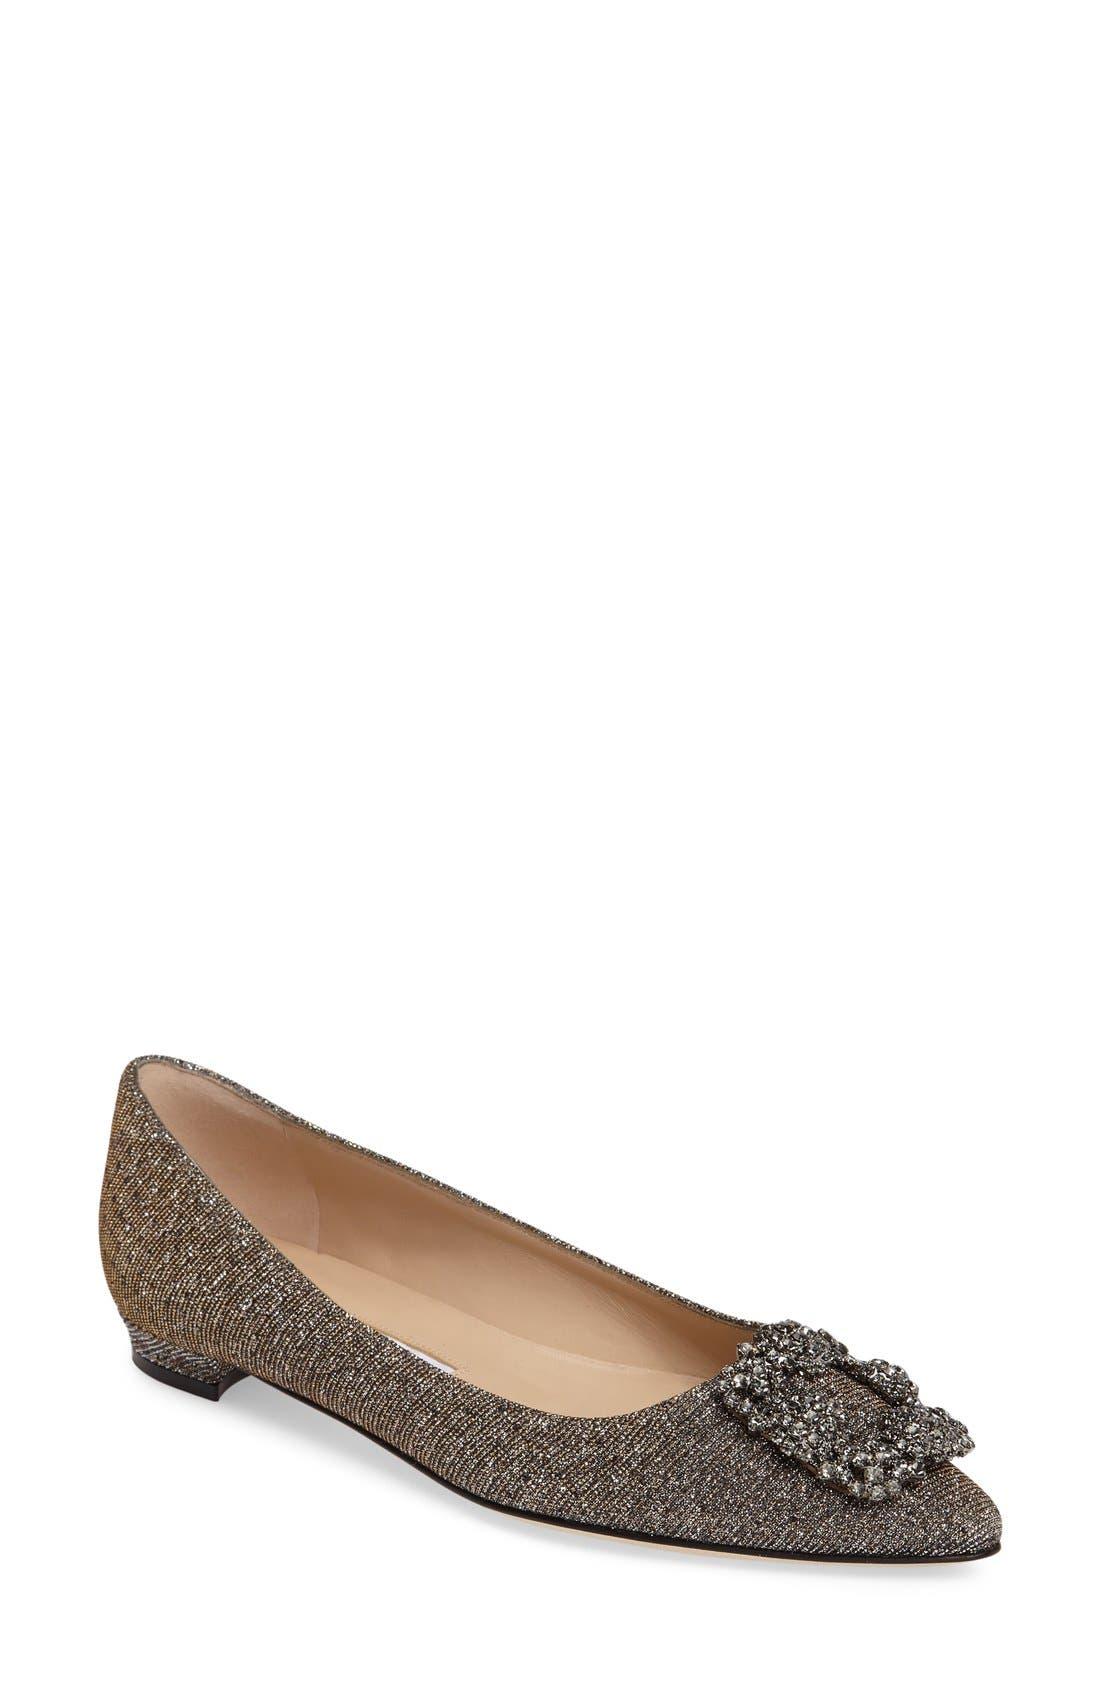 Manolo Blahnik 'Hangisi' Jeweled Pointy Toe Flat (Women)